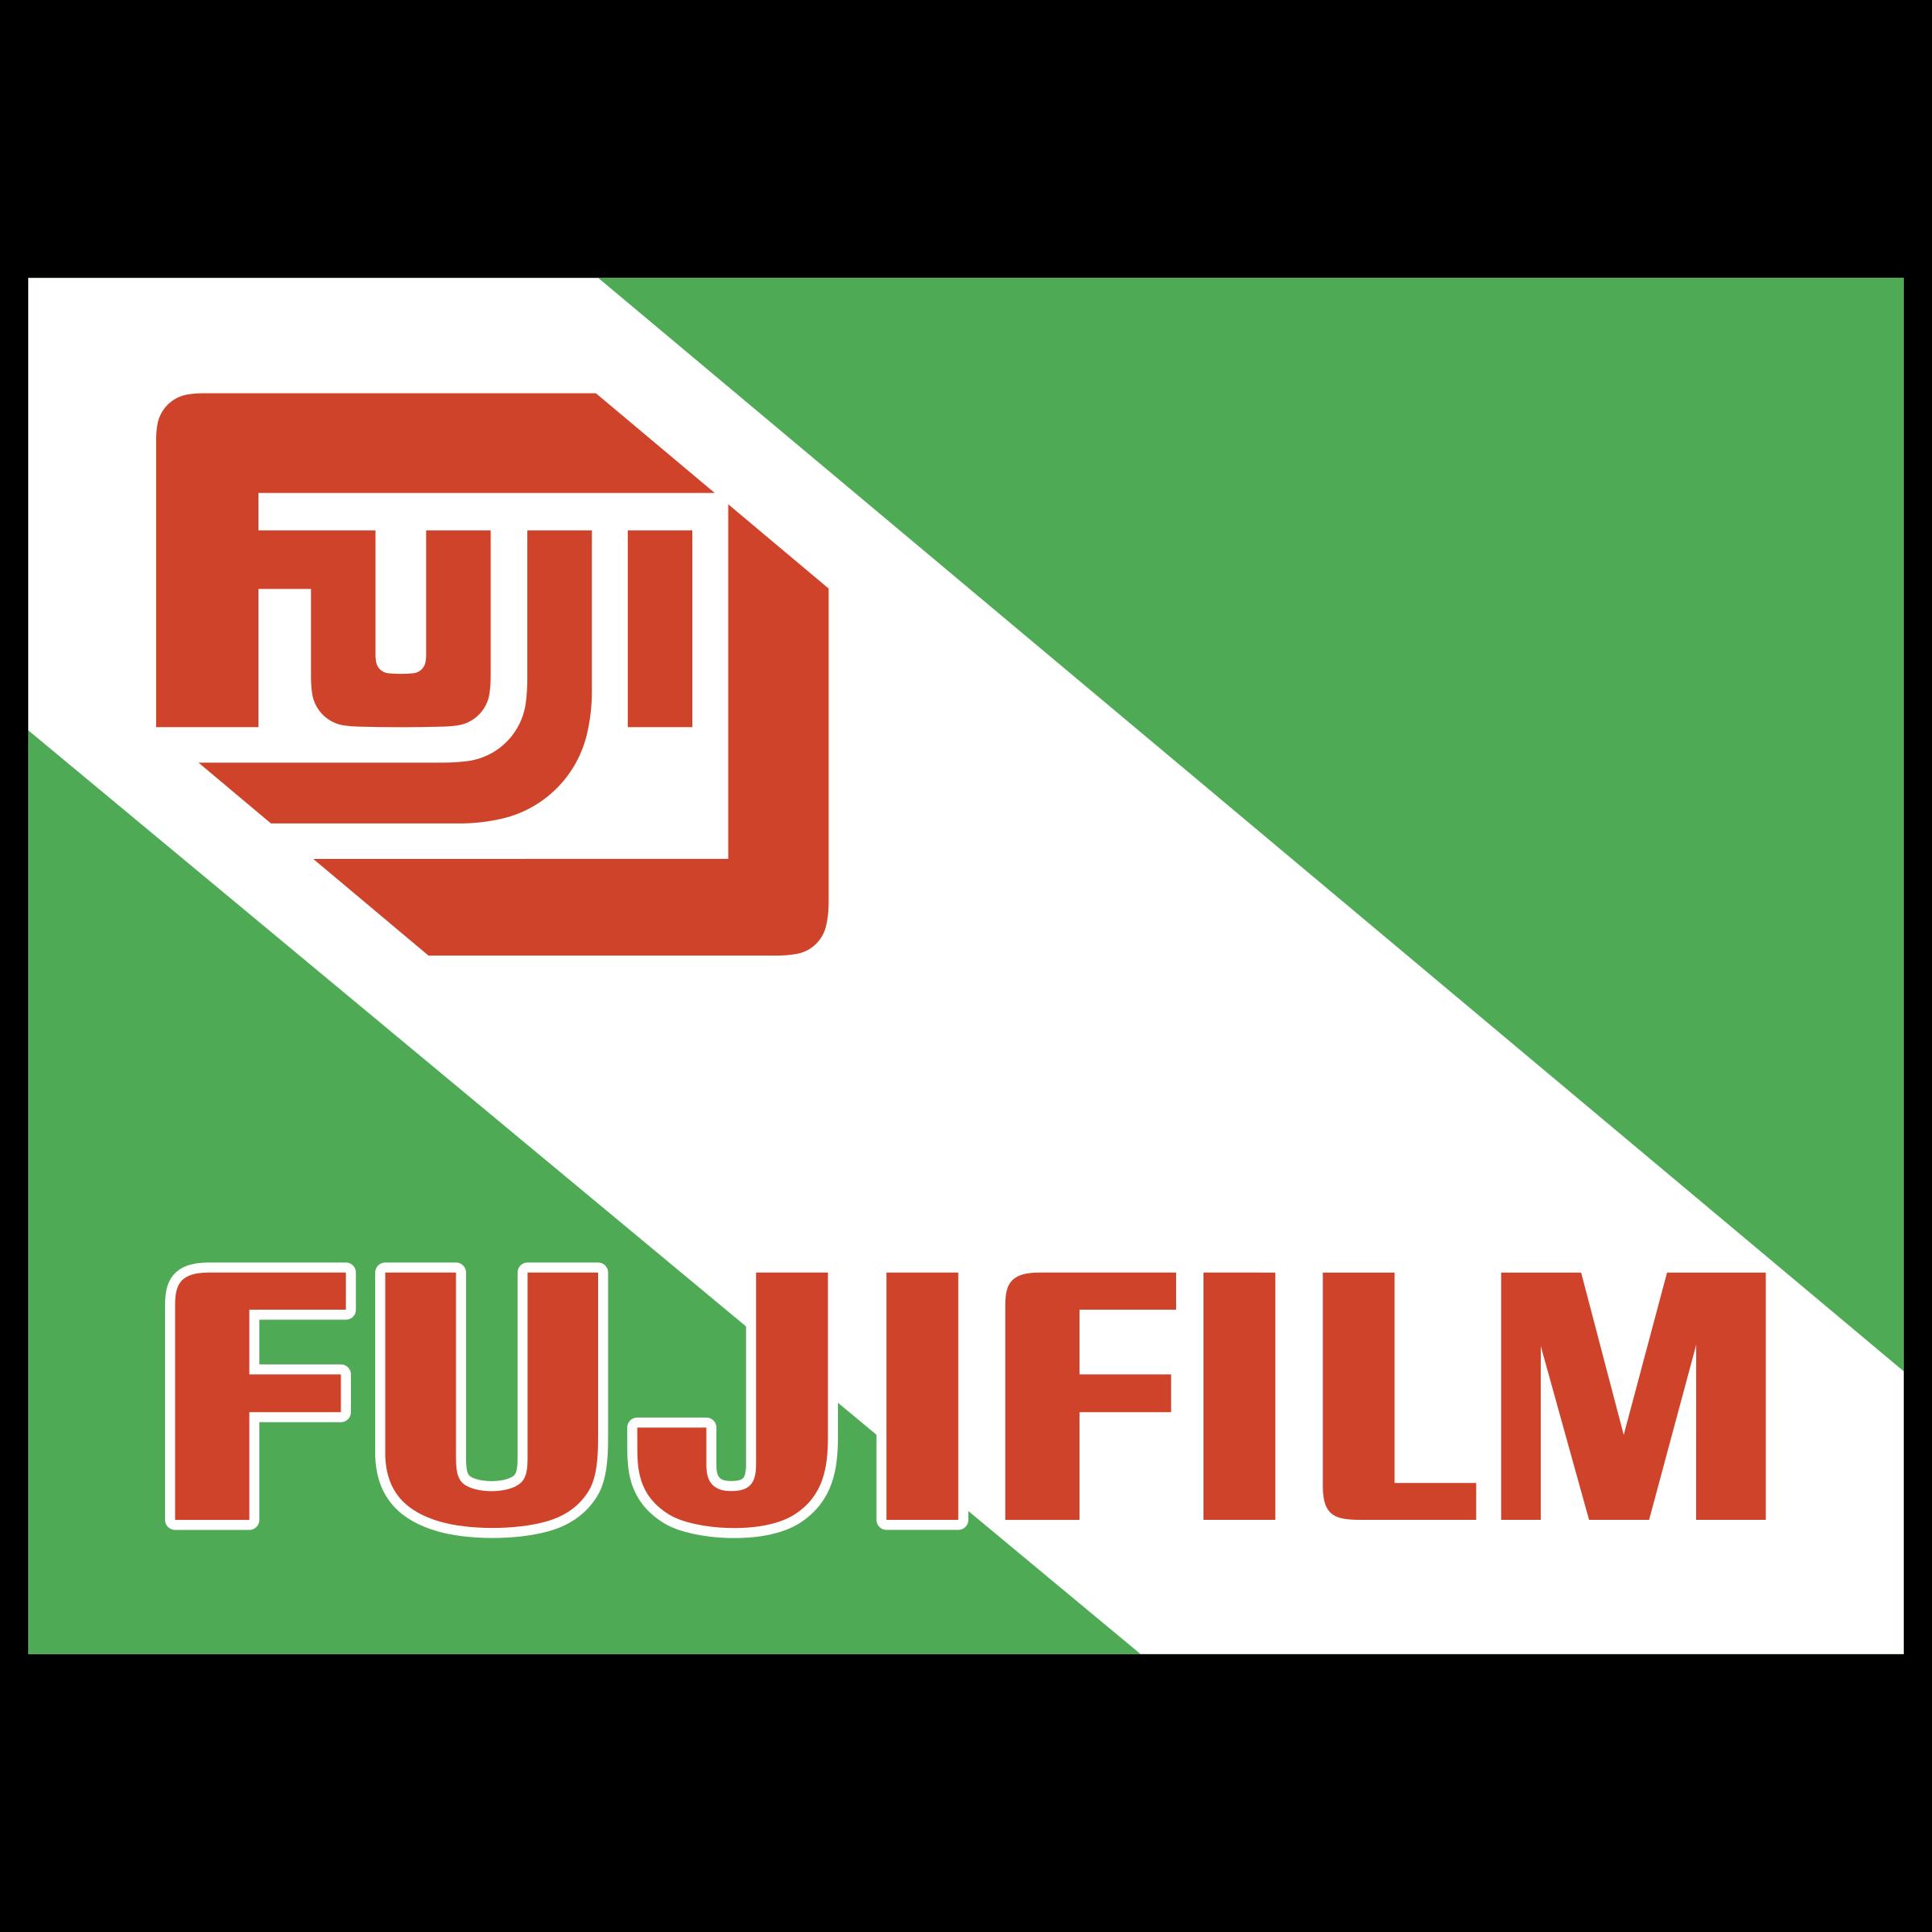 Fujifilm Logo PNG Transparent & SVG Vector.